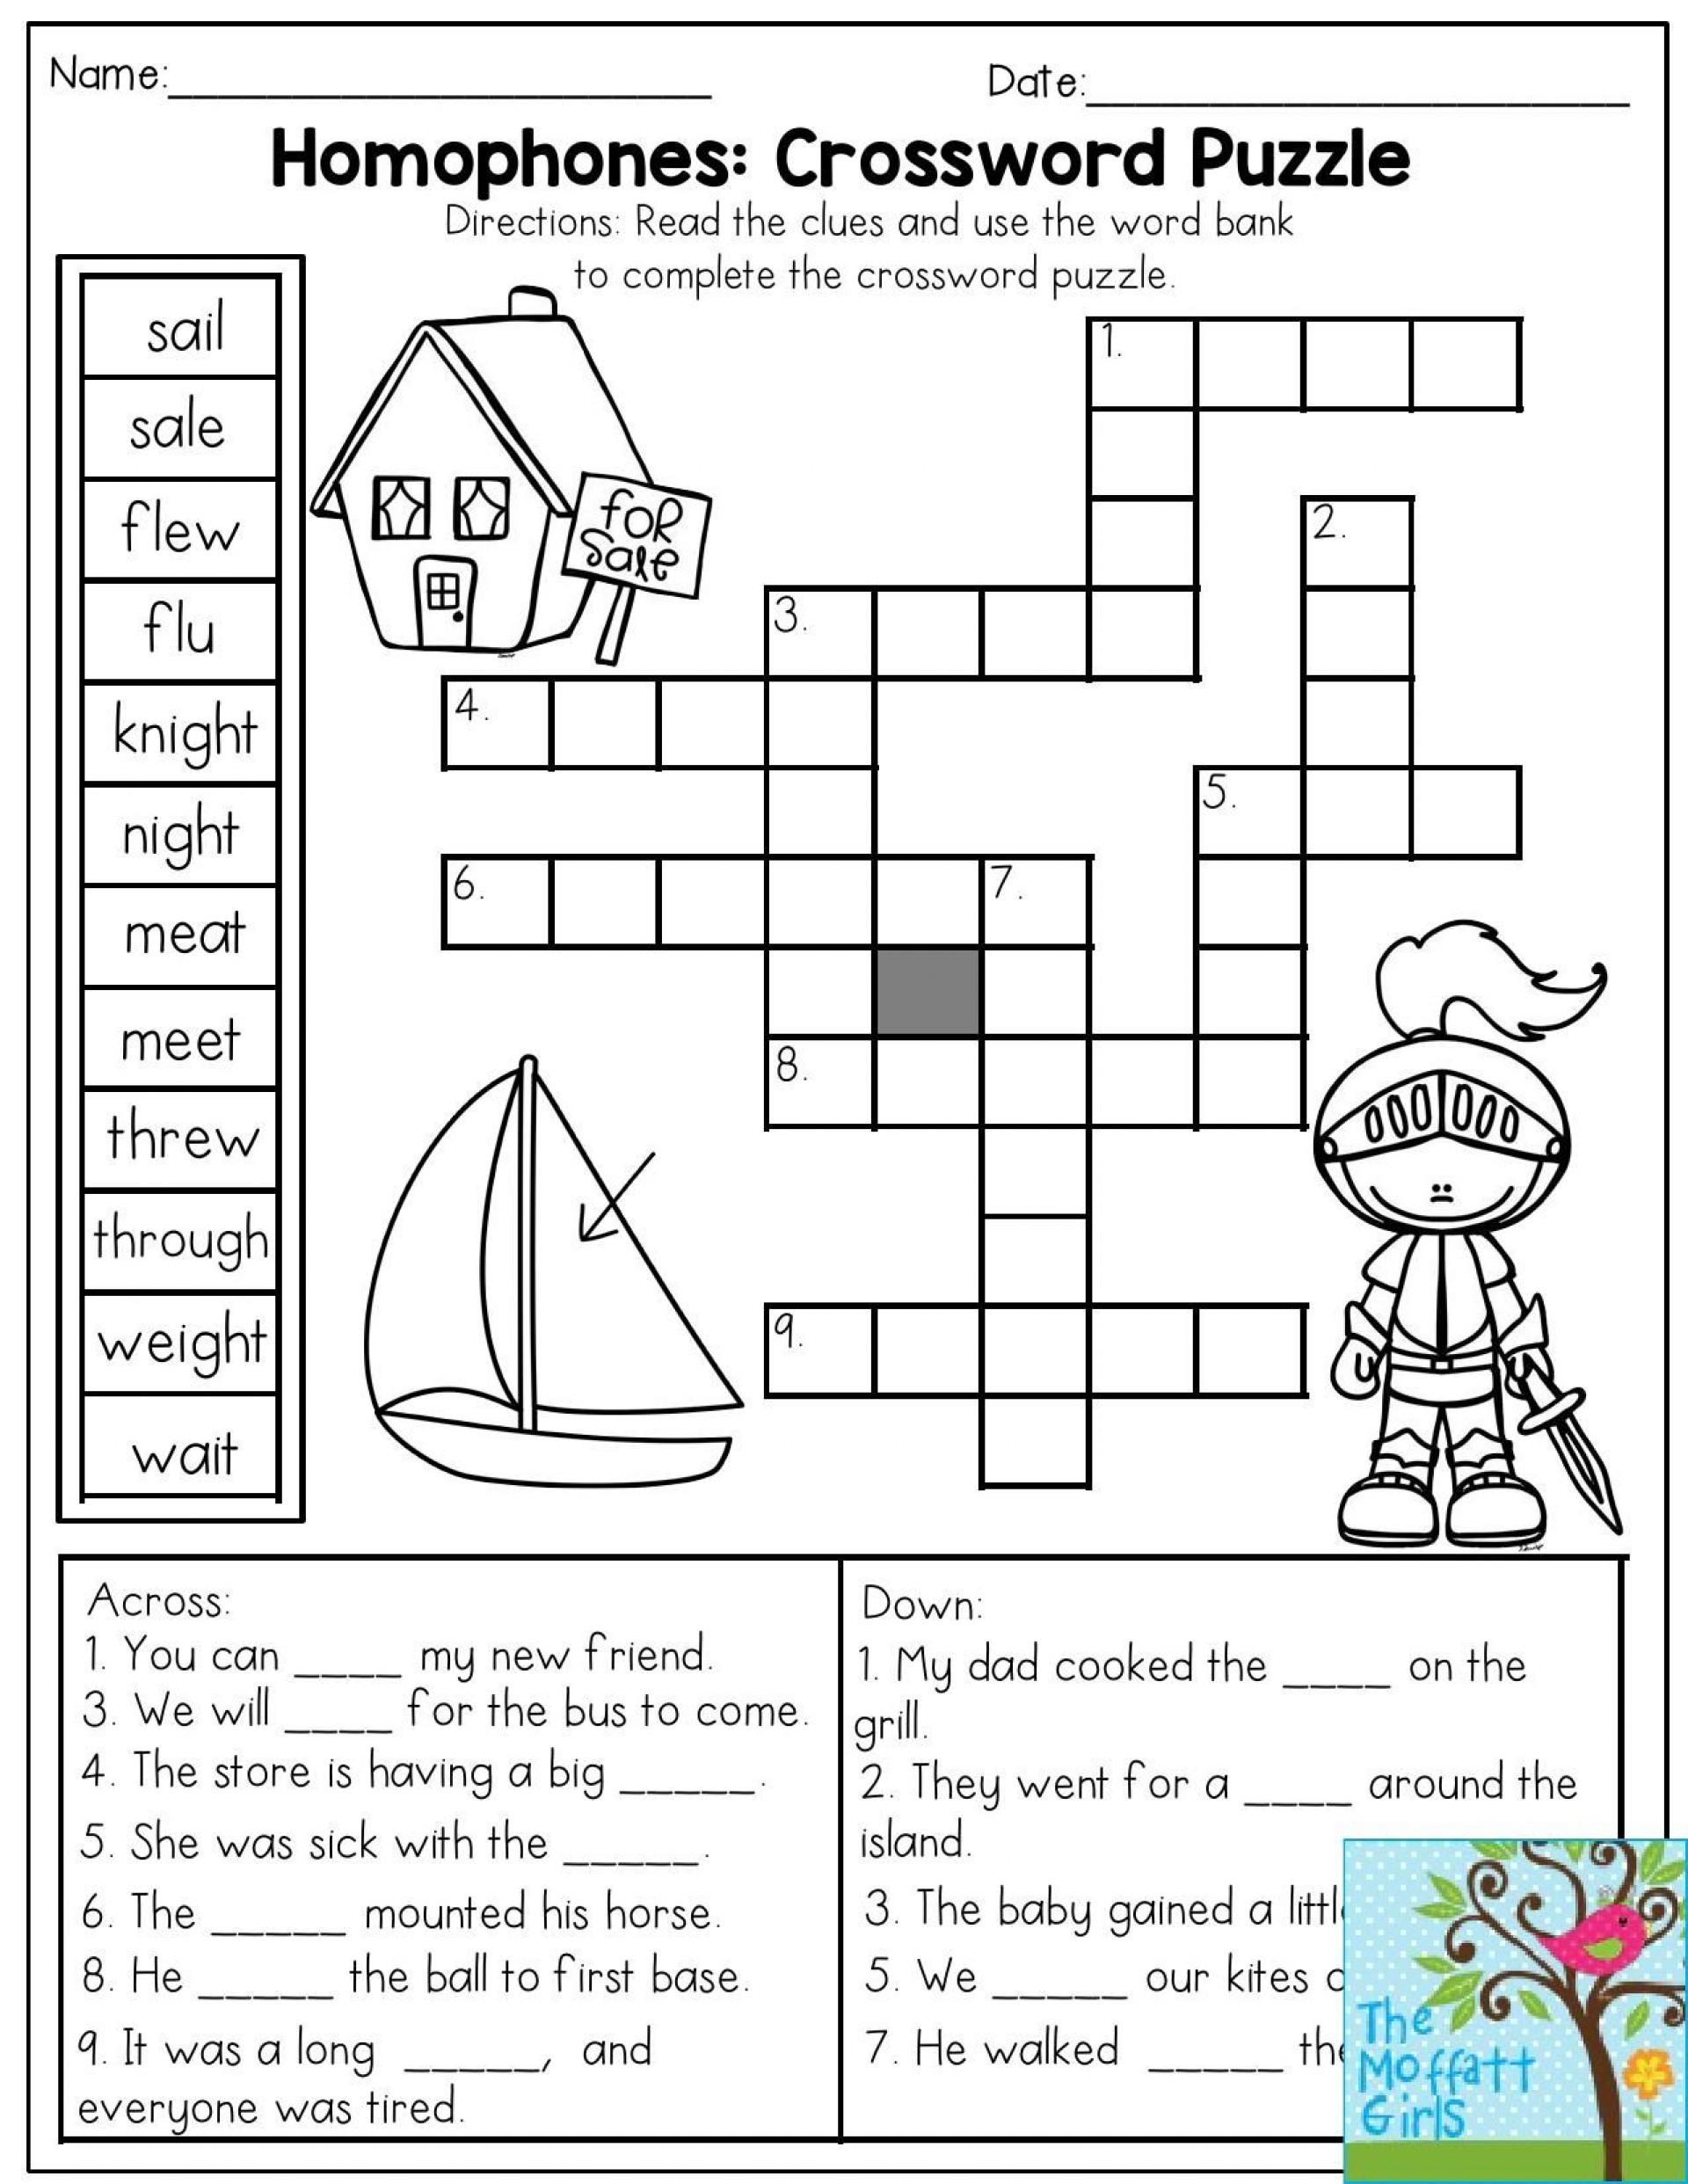 018 Name In Essays Crossword Clue Essay Excellent 1920